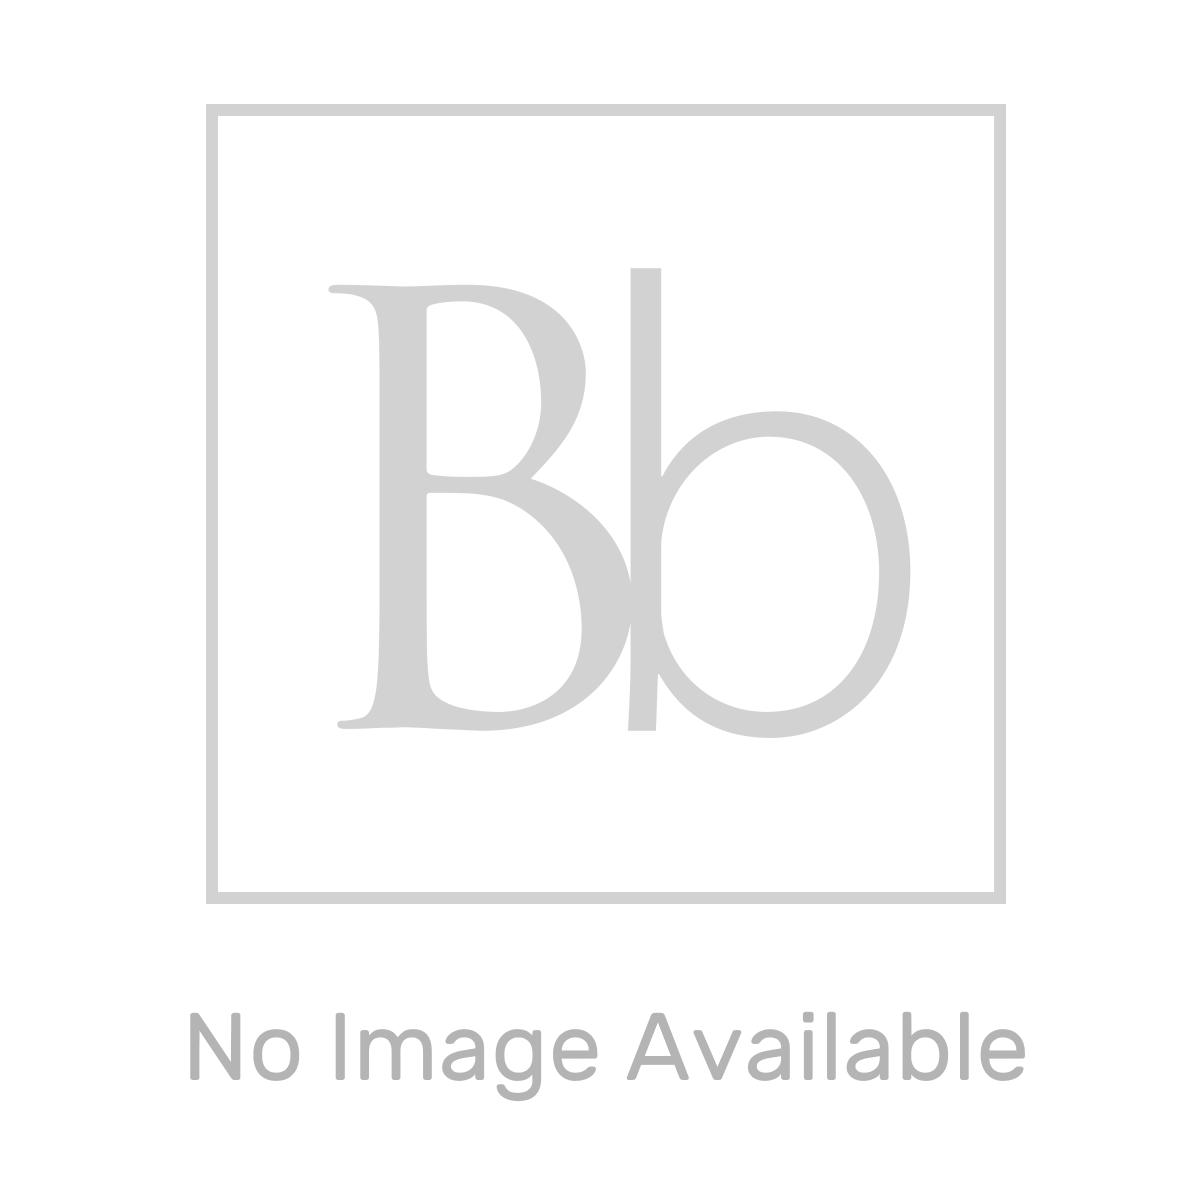 HiB Eris 40 Single Door Mirrored Cabinet